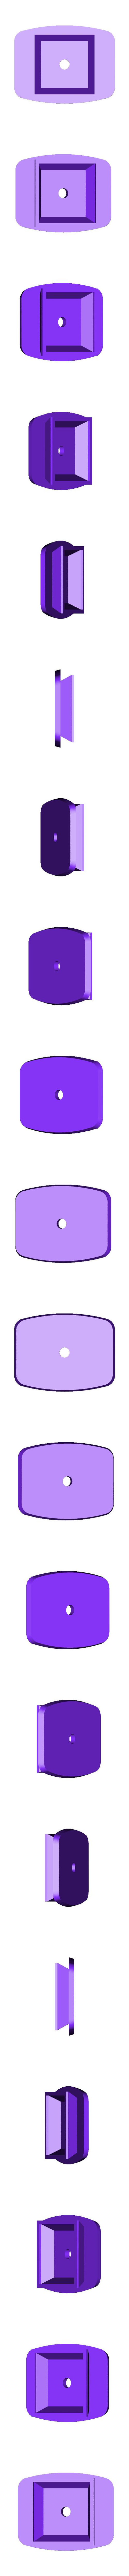 Hama_Tripod.STL Download free STL file Hama Tripod Camera Mount • 3D printable template, flavio12